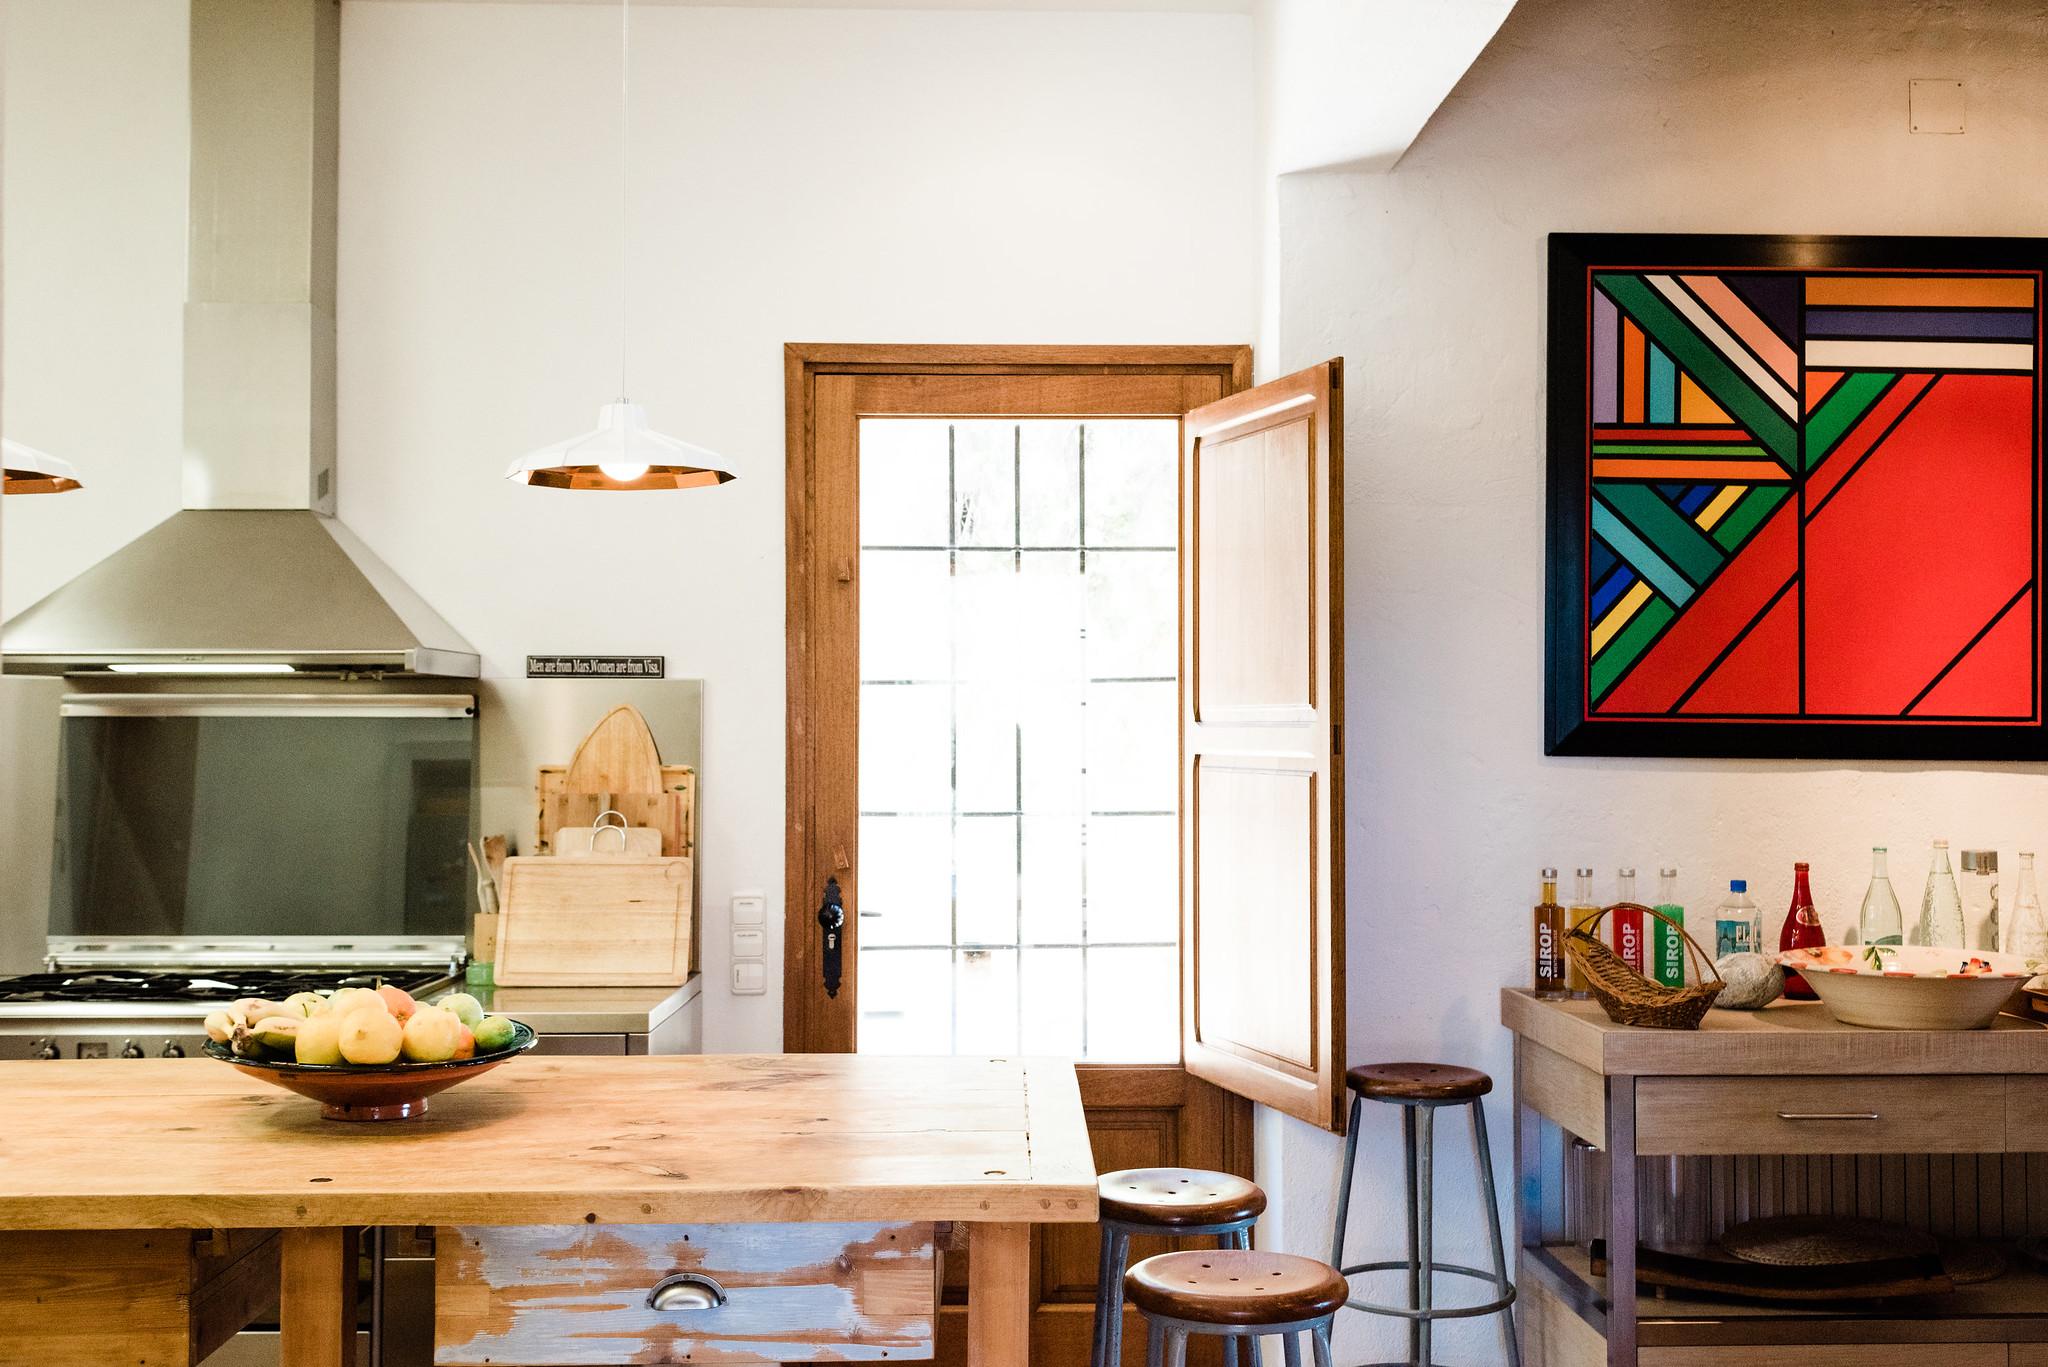 https://www.white-ibiza.com/wp-content/uploads/2020/06/white-ibiza-villas-villa-andrea-interior-kitchen.jpg